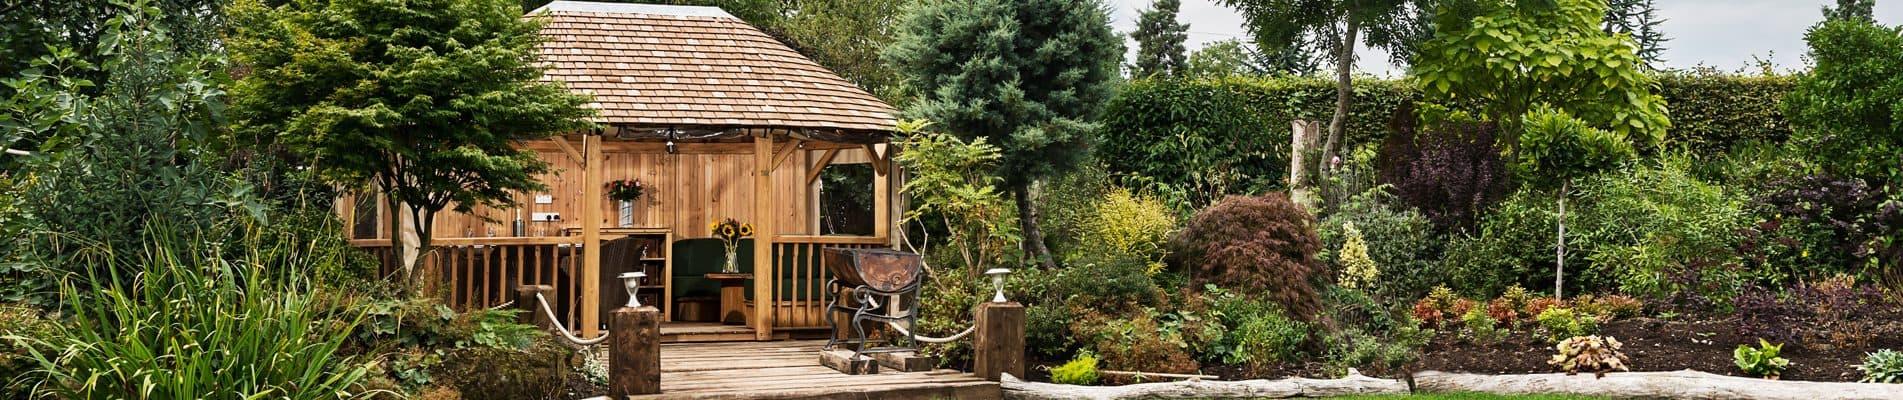 Luxury Wooden Hampton Pavilion